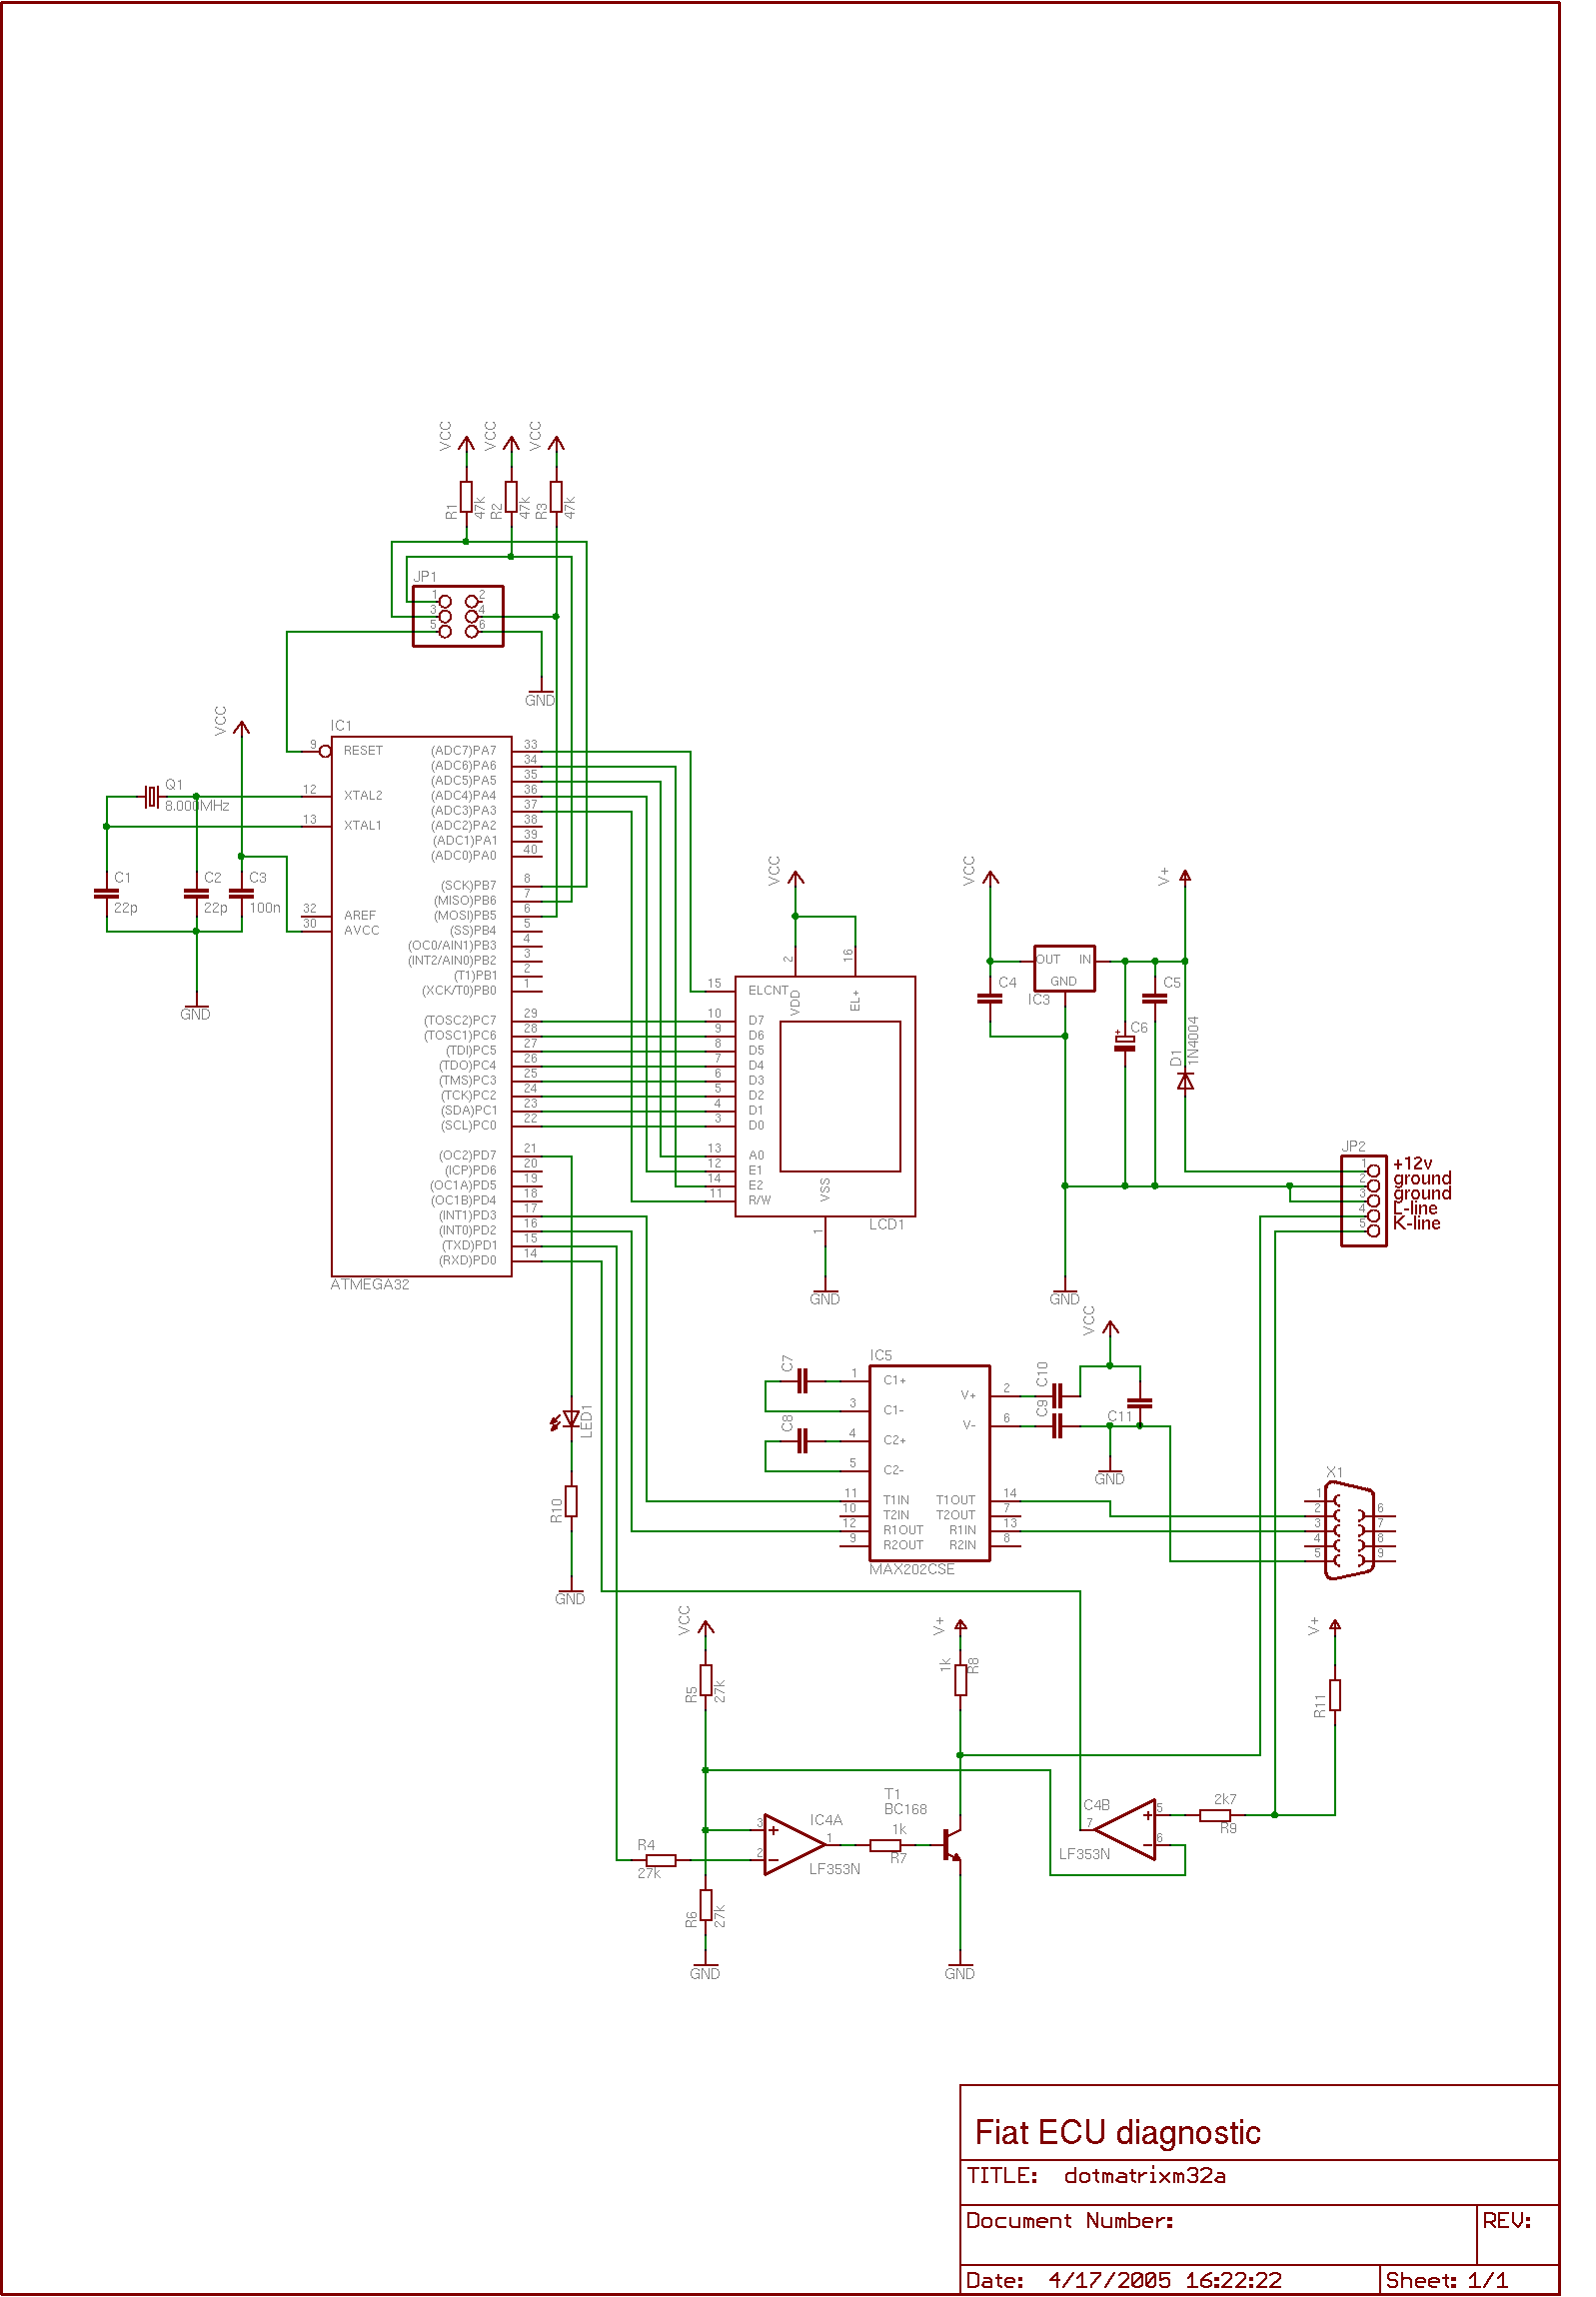 Fiat Coupe 20v Wiring Diagram Turbo Vems Ecu Engine Management Farm Tractor 34